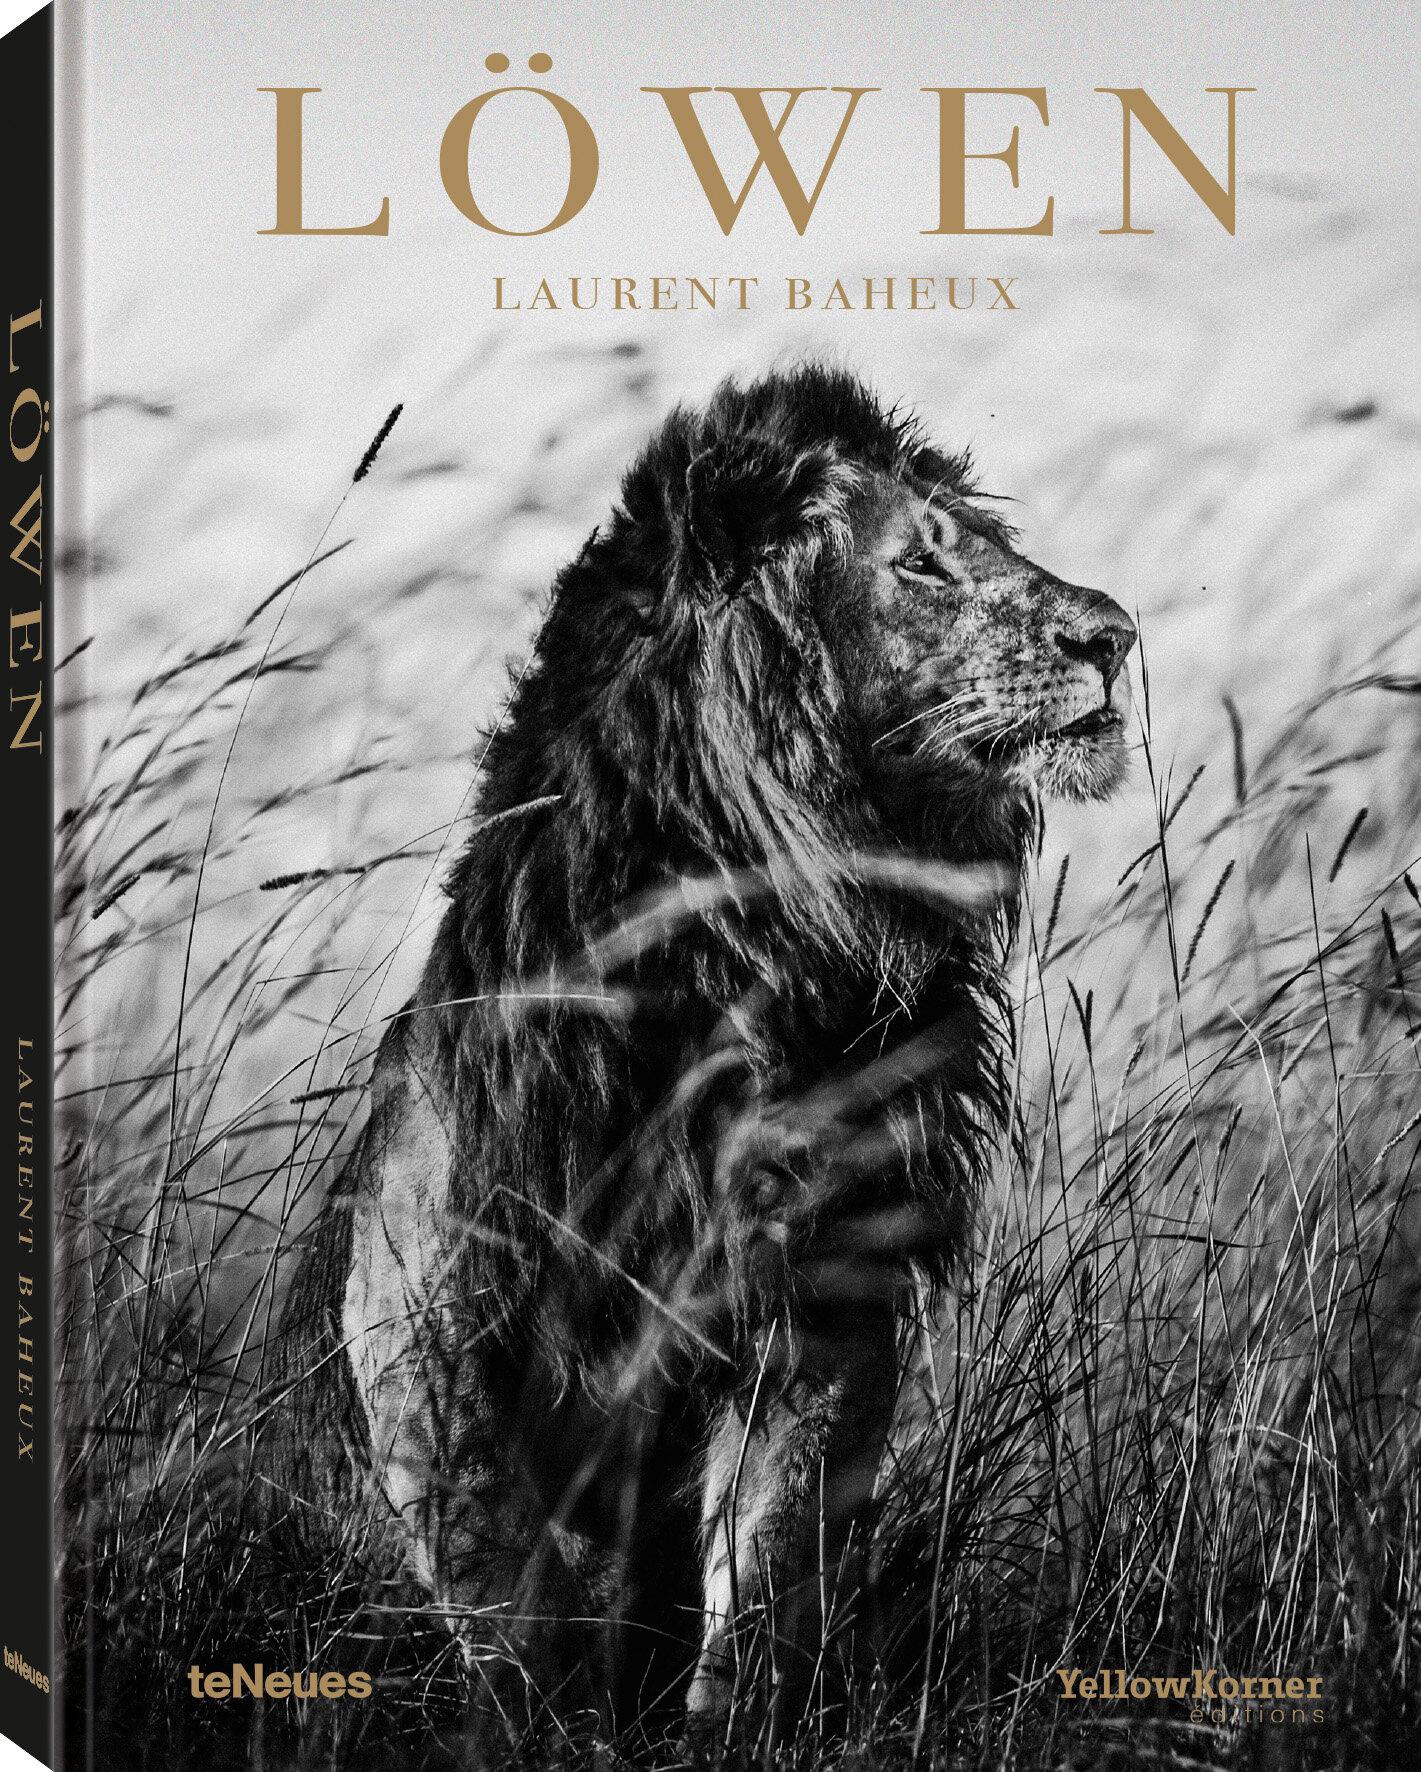 © Löwen von Laurent Baheux, erschienen bei teNeues, € 40,  www.teneues.com ,  Lion in the grass I, Kenya 2013,  Photo © 2019 Laurent Baheux. Alle Rechte vorbehalten.